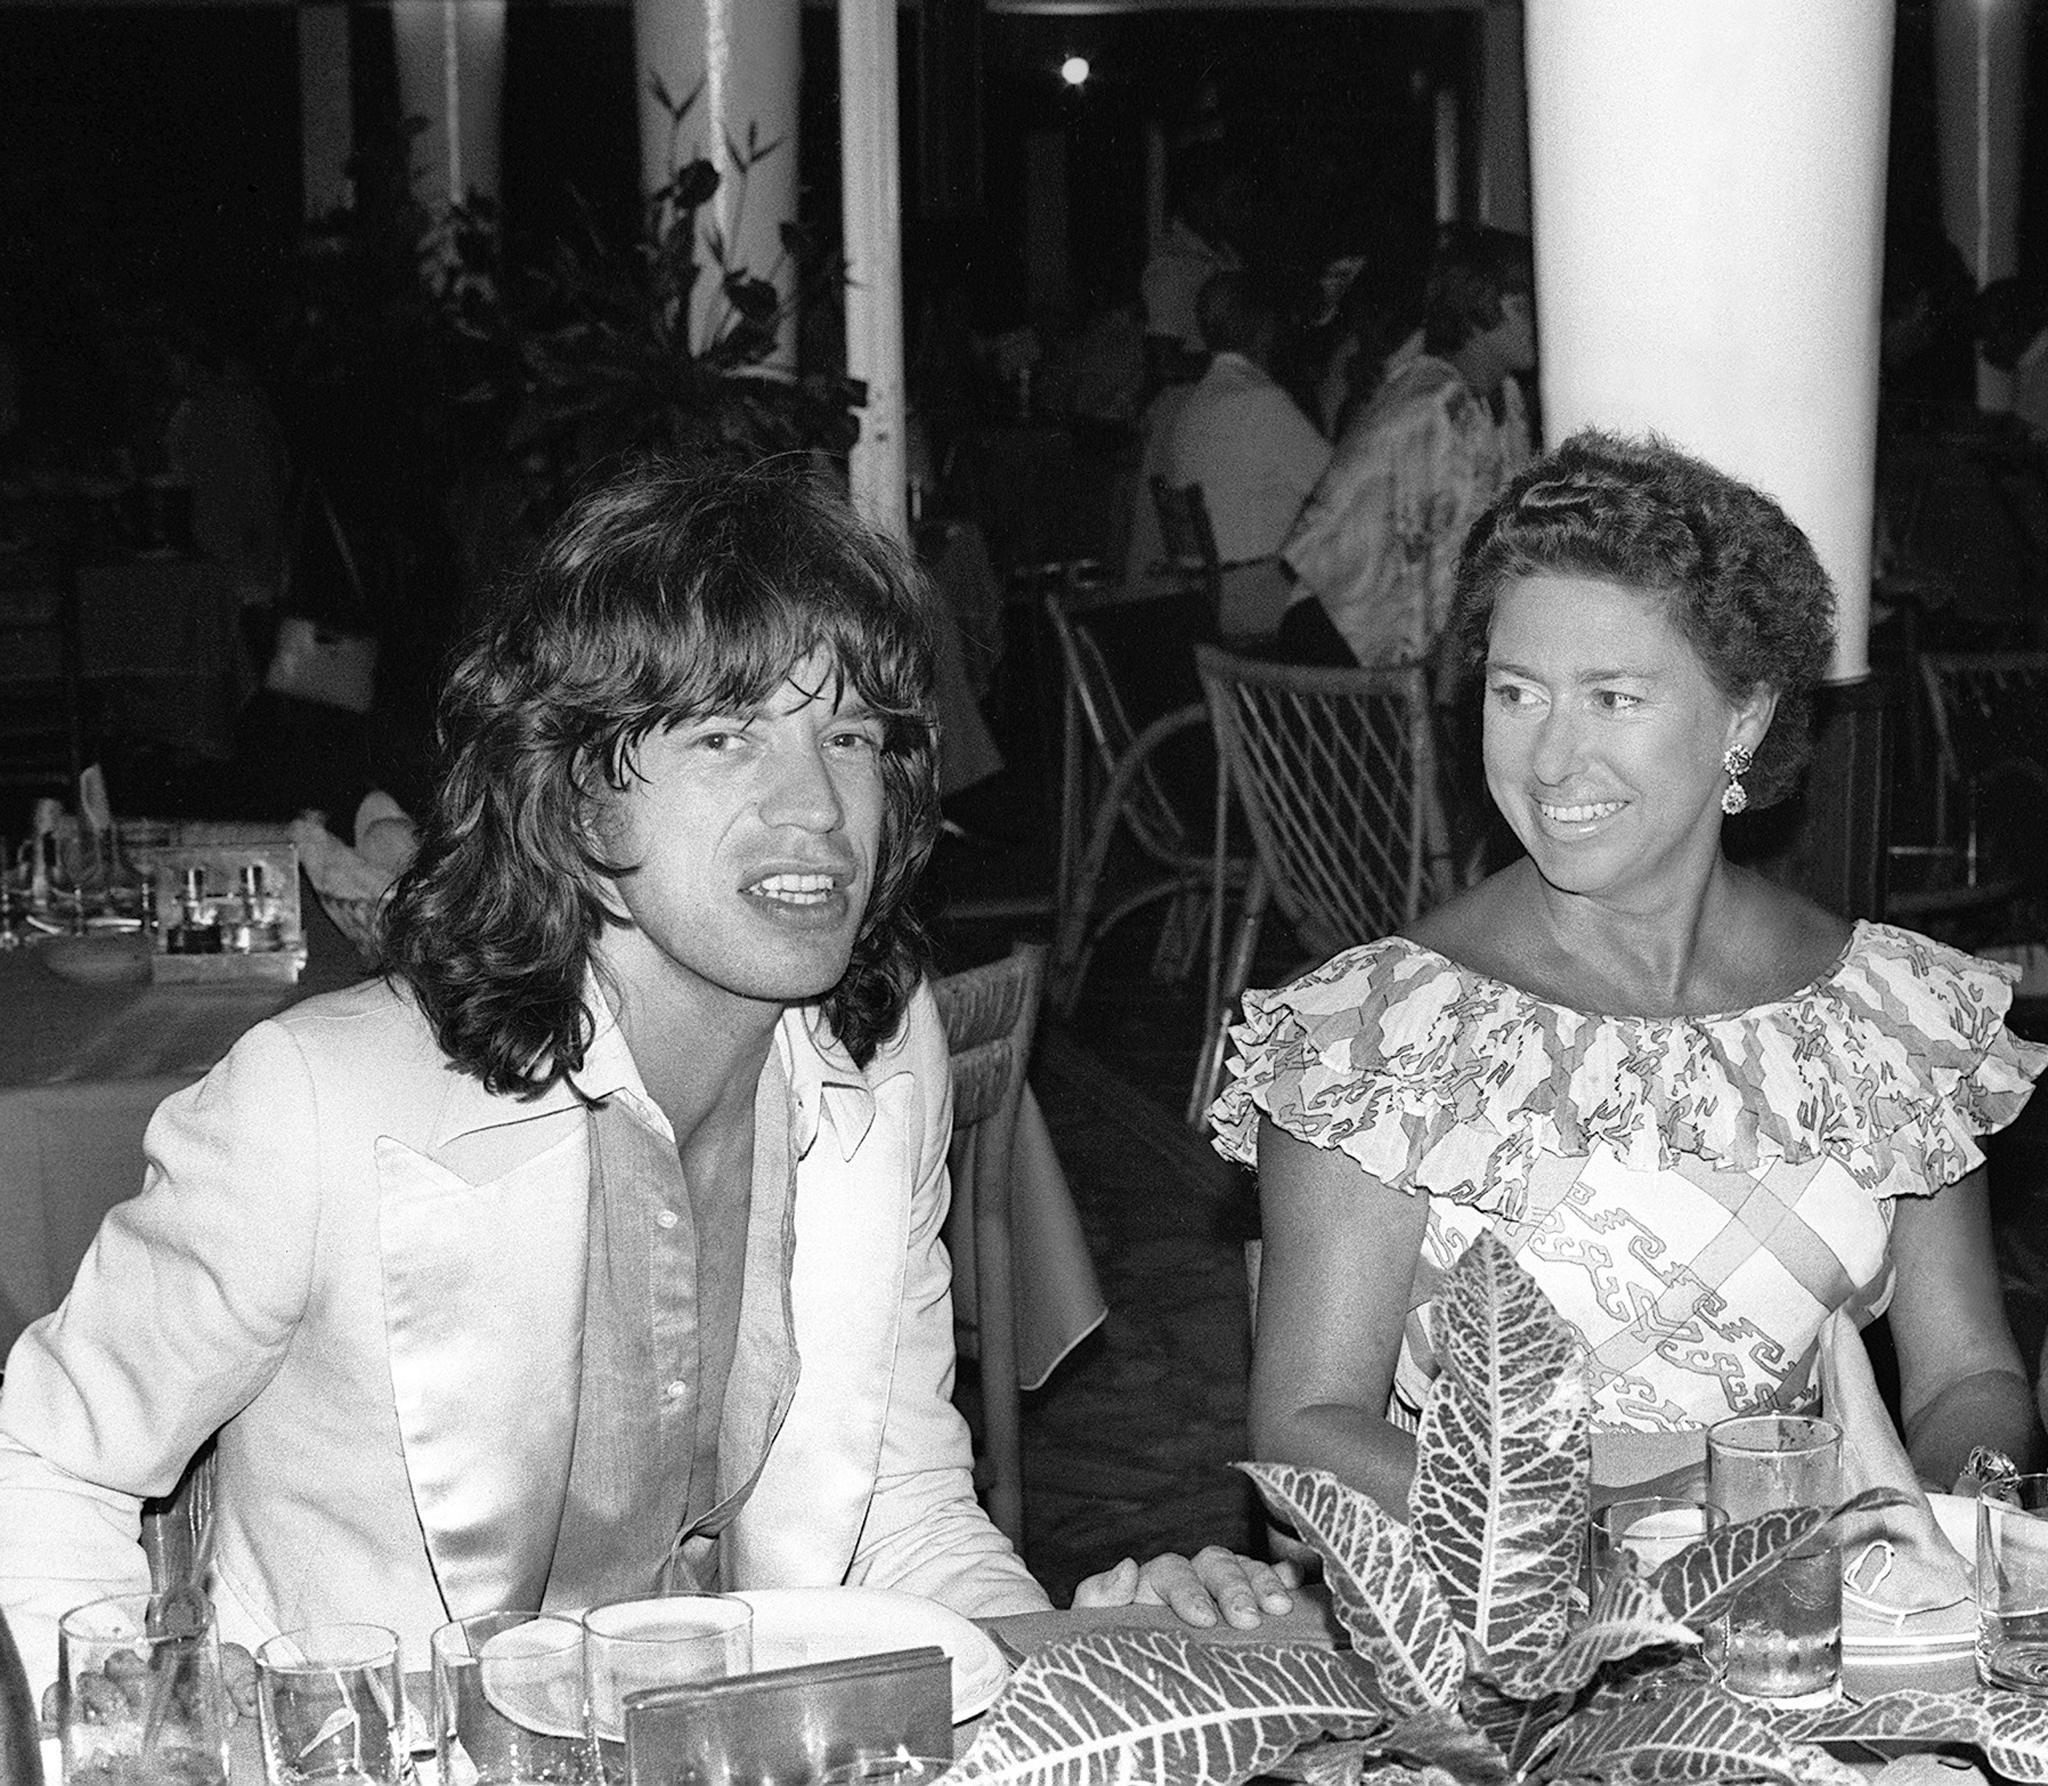 Mick Jagger 1976 with Princess Margaret